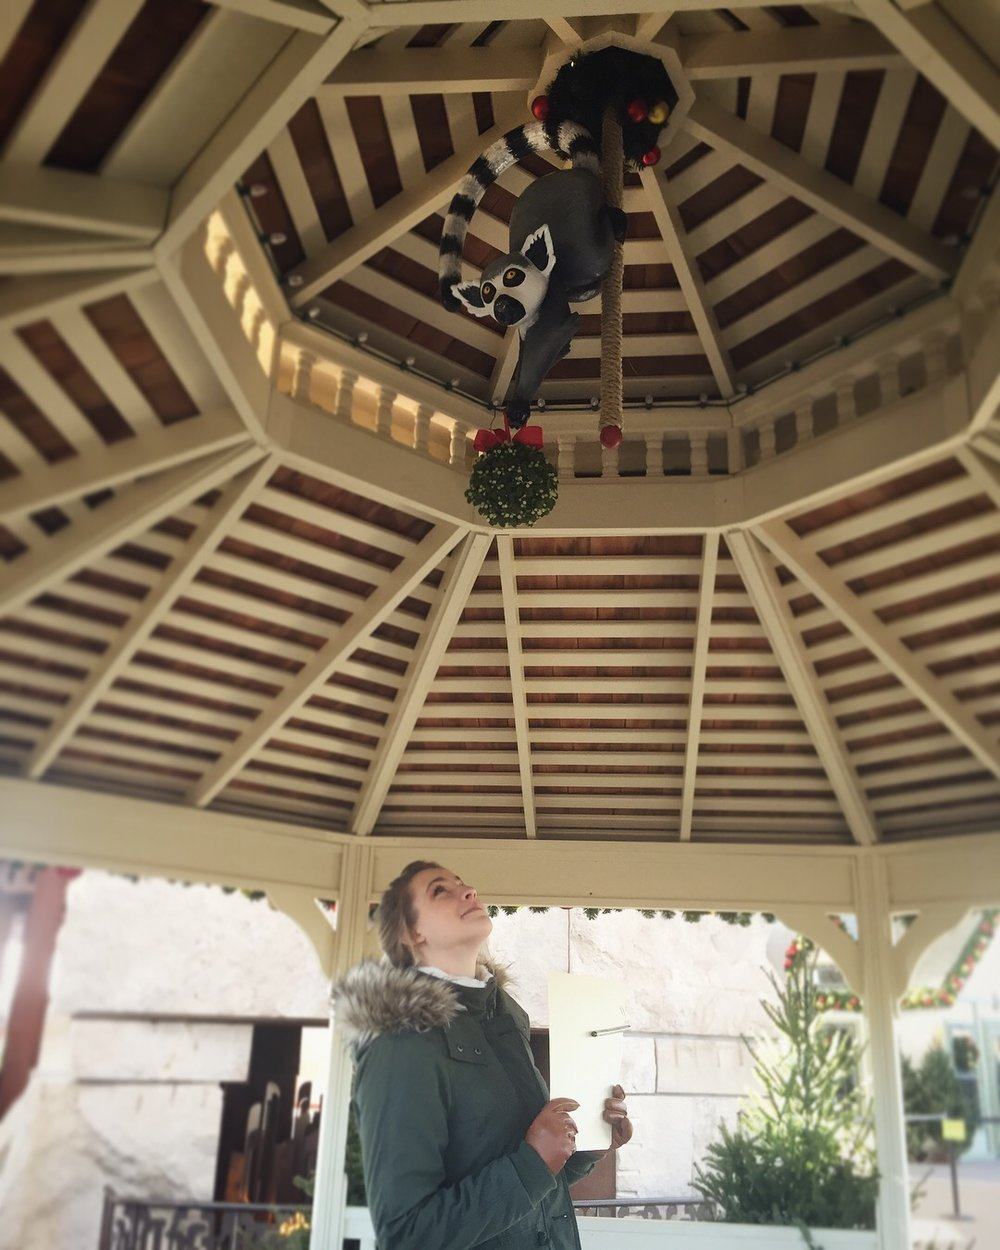 Indianapolis_Zoo_Lemur_Gazebo_Christmas